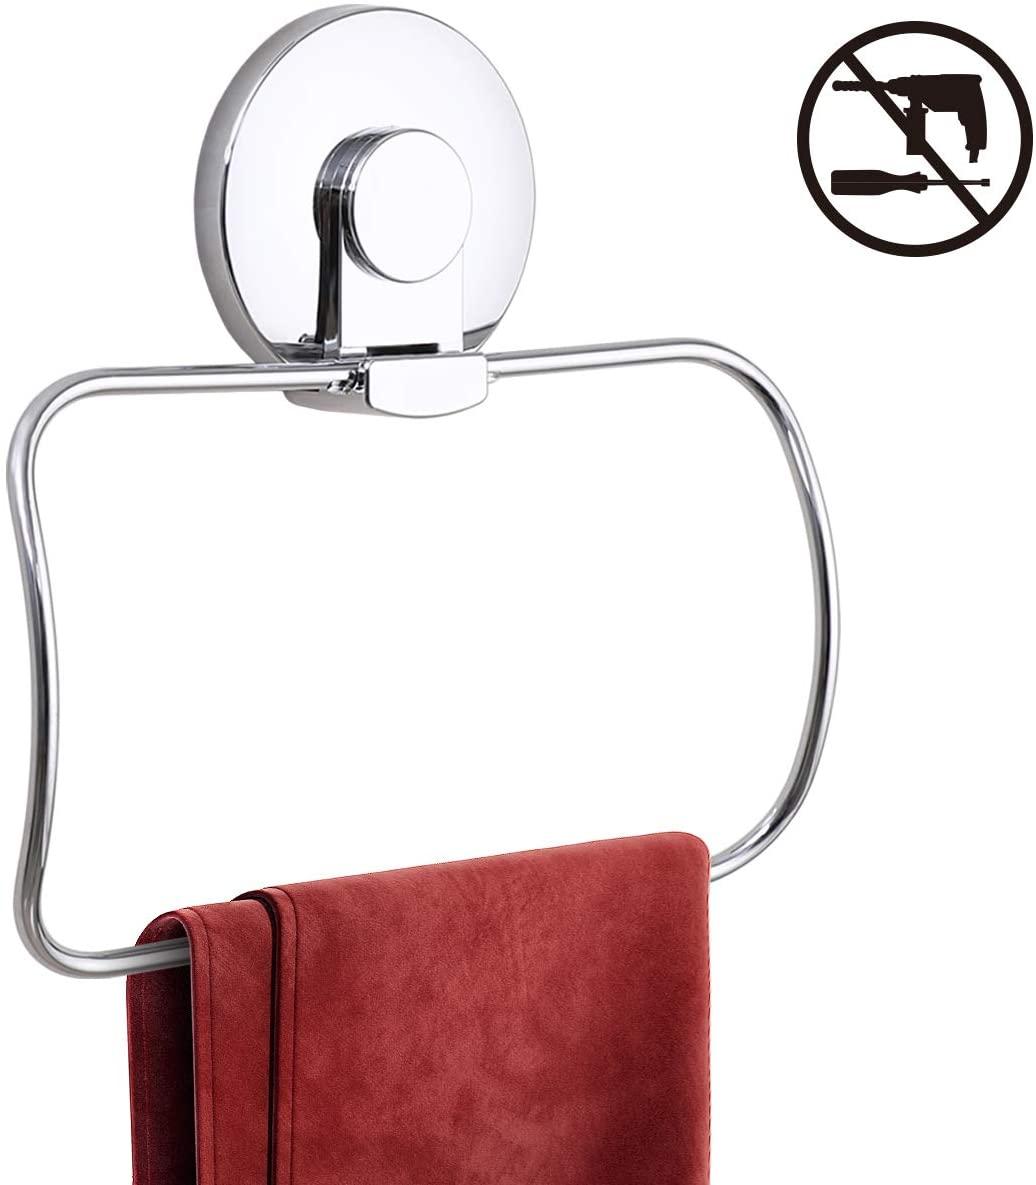 Swamtik NO-Drilling Chromed Towel Rack Suction Cup Hooks Hanging for Bathroom Kitchen